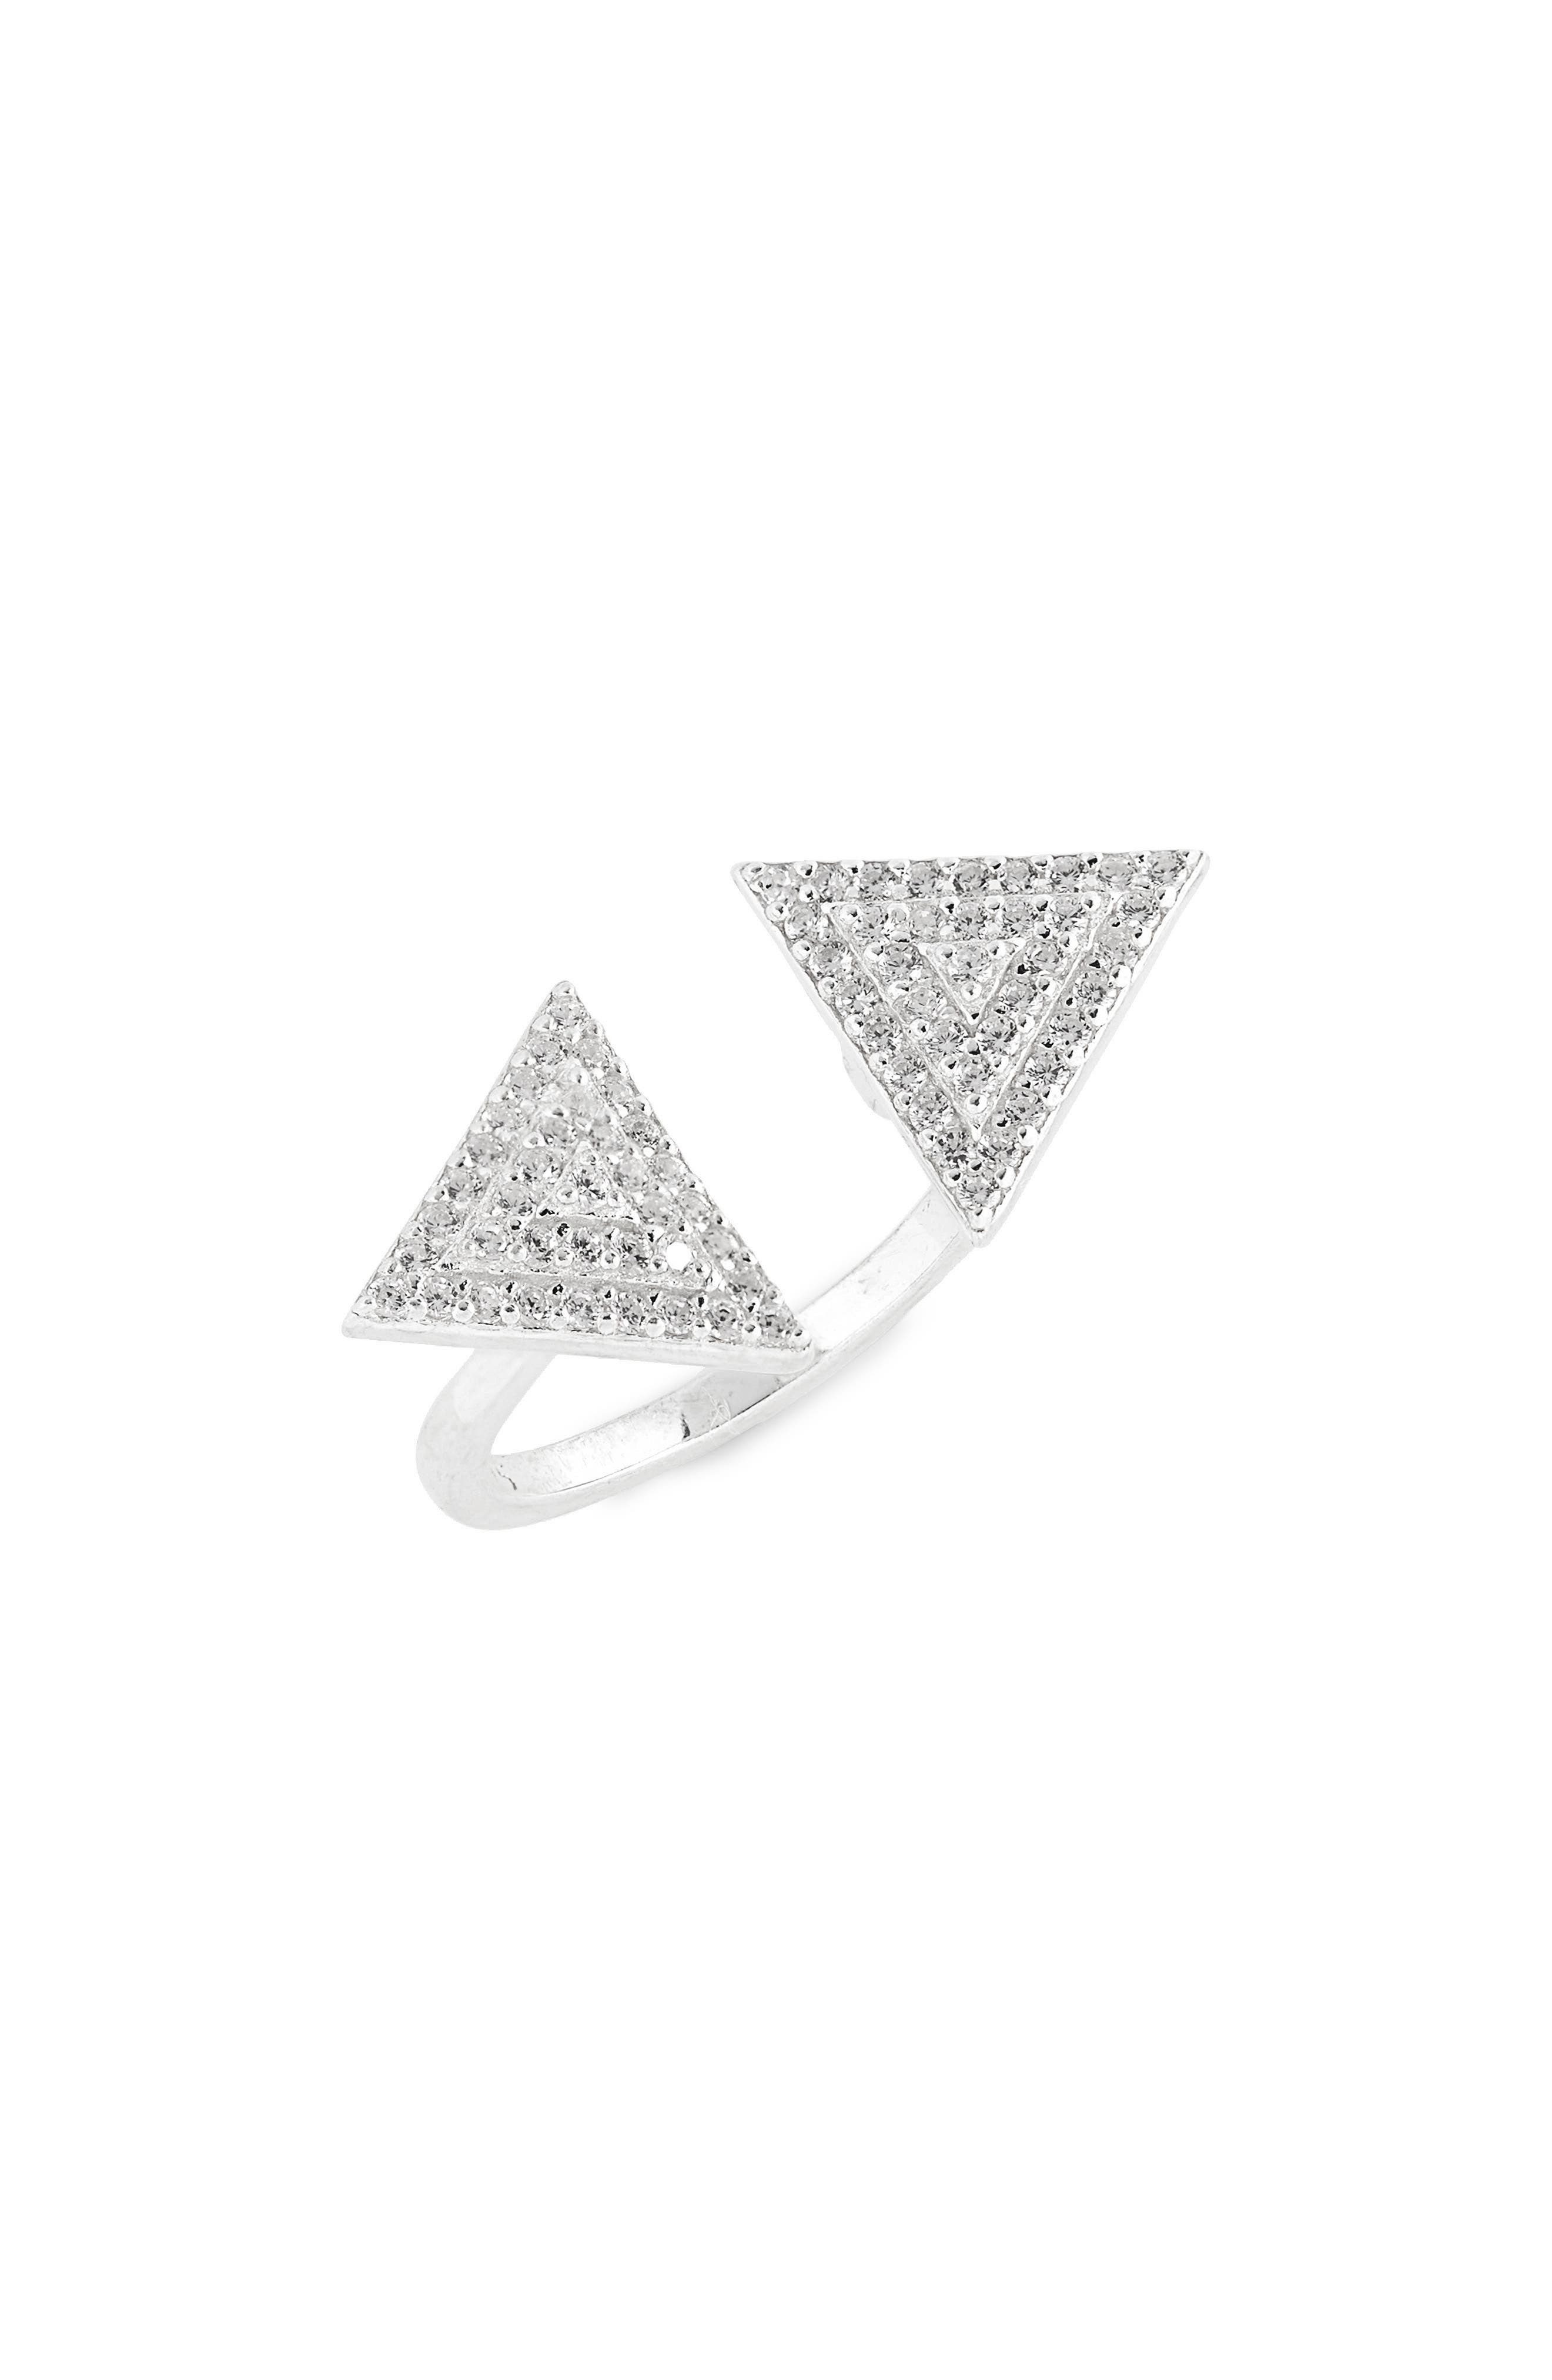 Crystal Open Ring,                             Main thumbnail 1, color,                             042